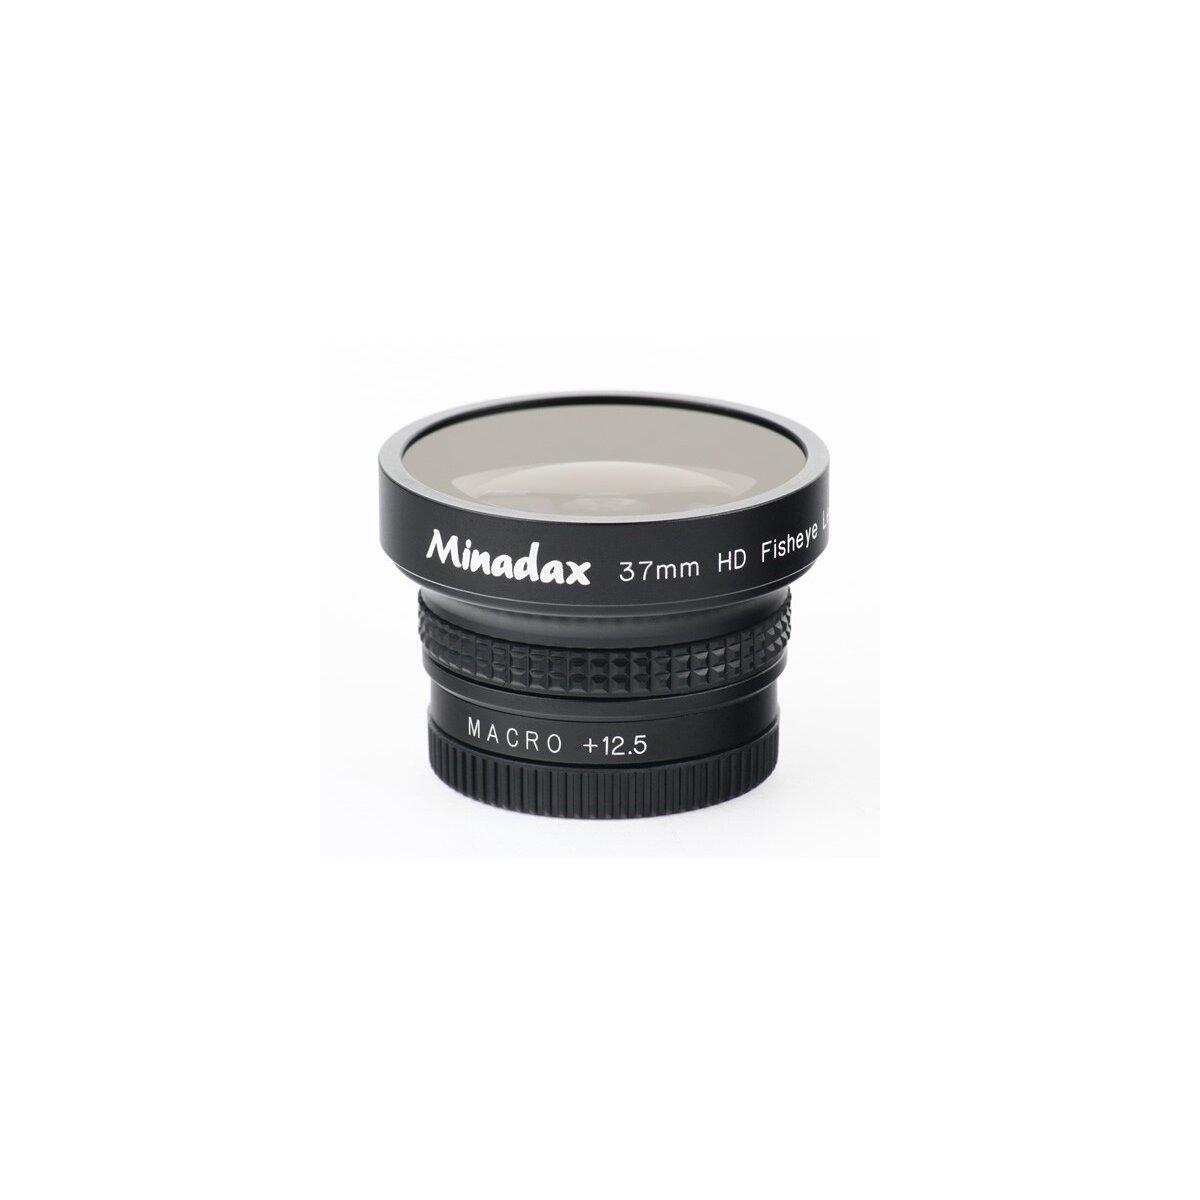 0.42x Minadax Fisheye Vorsatz fuer Panasonic NV-GS17, NV-GS27, NV-GS60, VDR-D150, VDR-D160, HDC-SD10